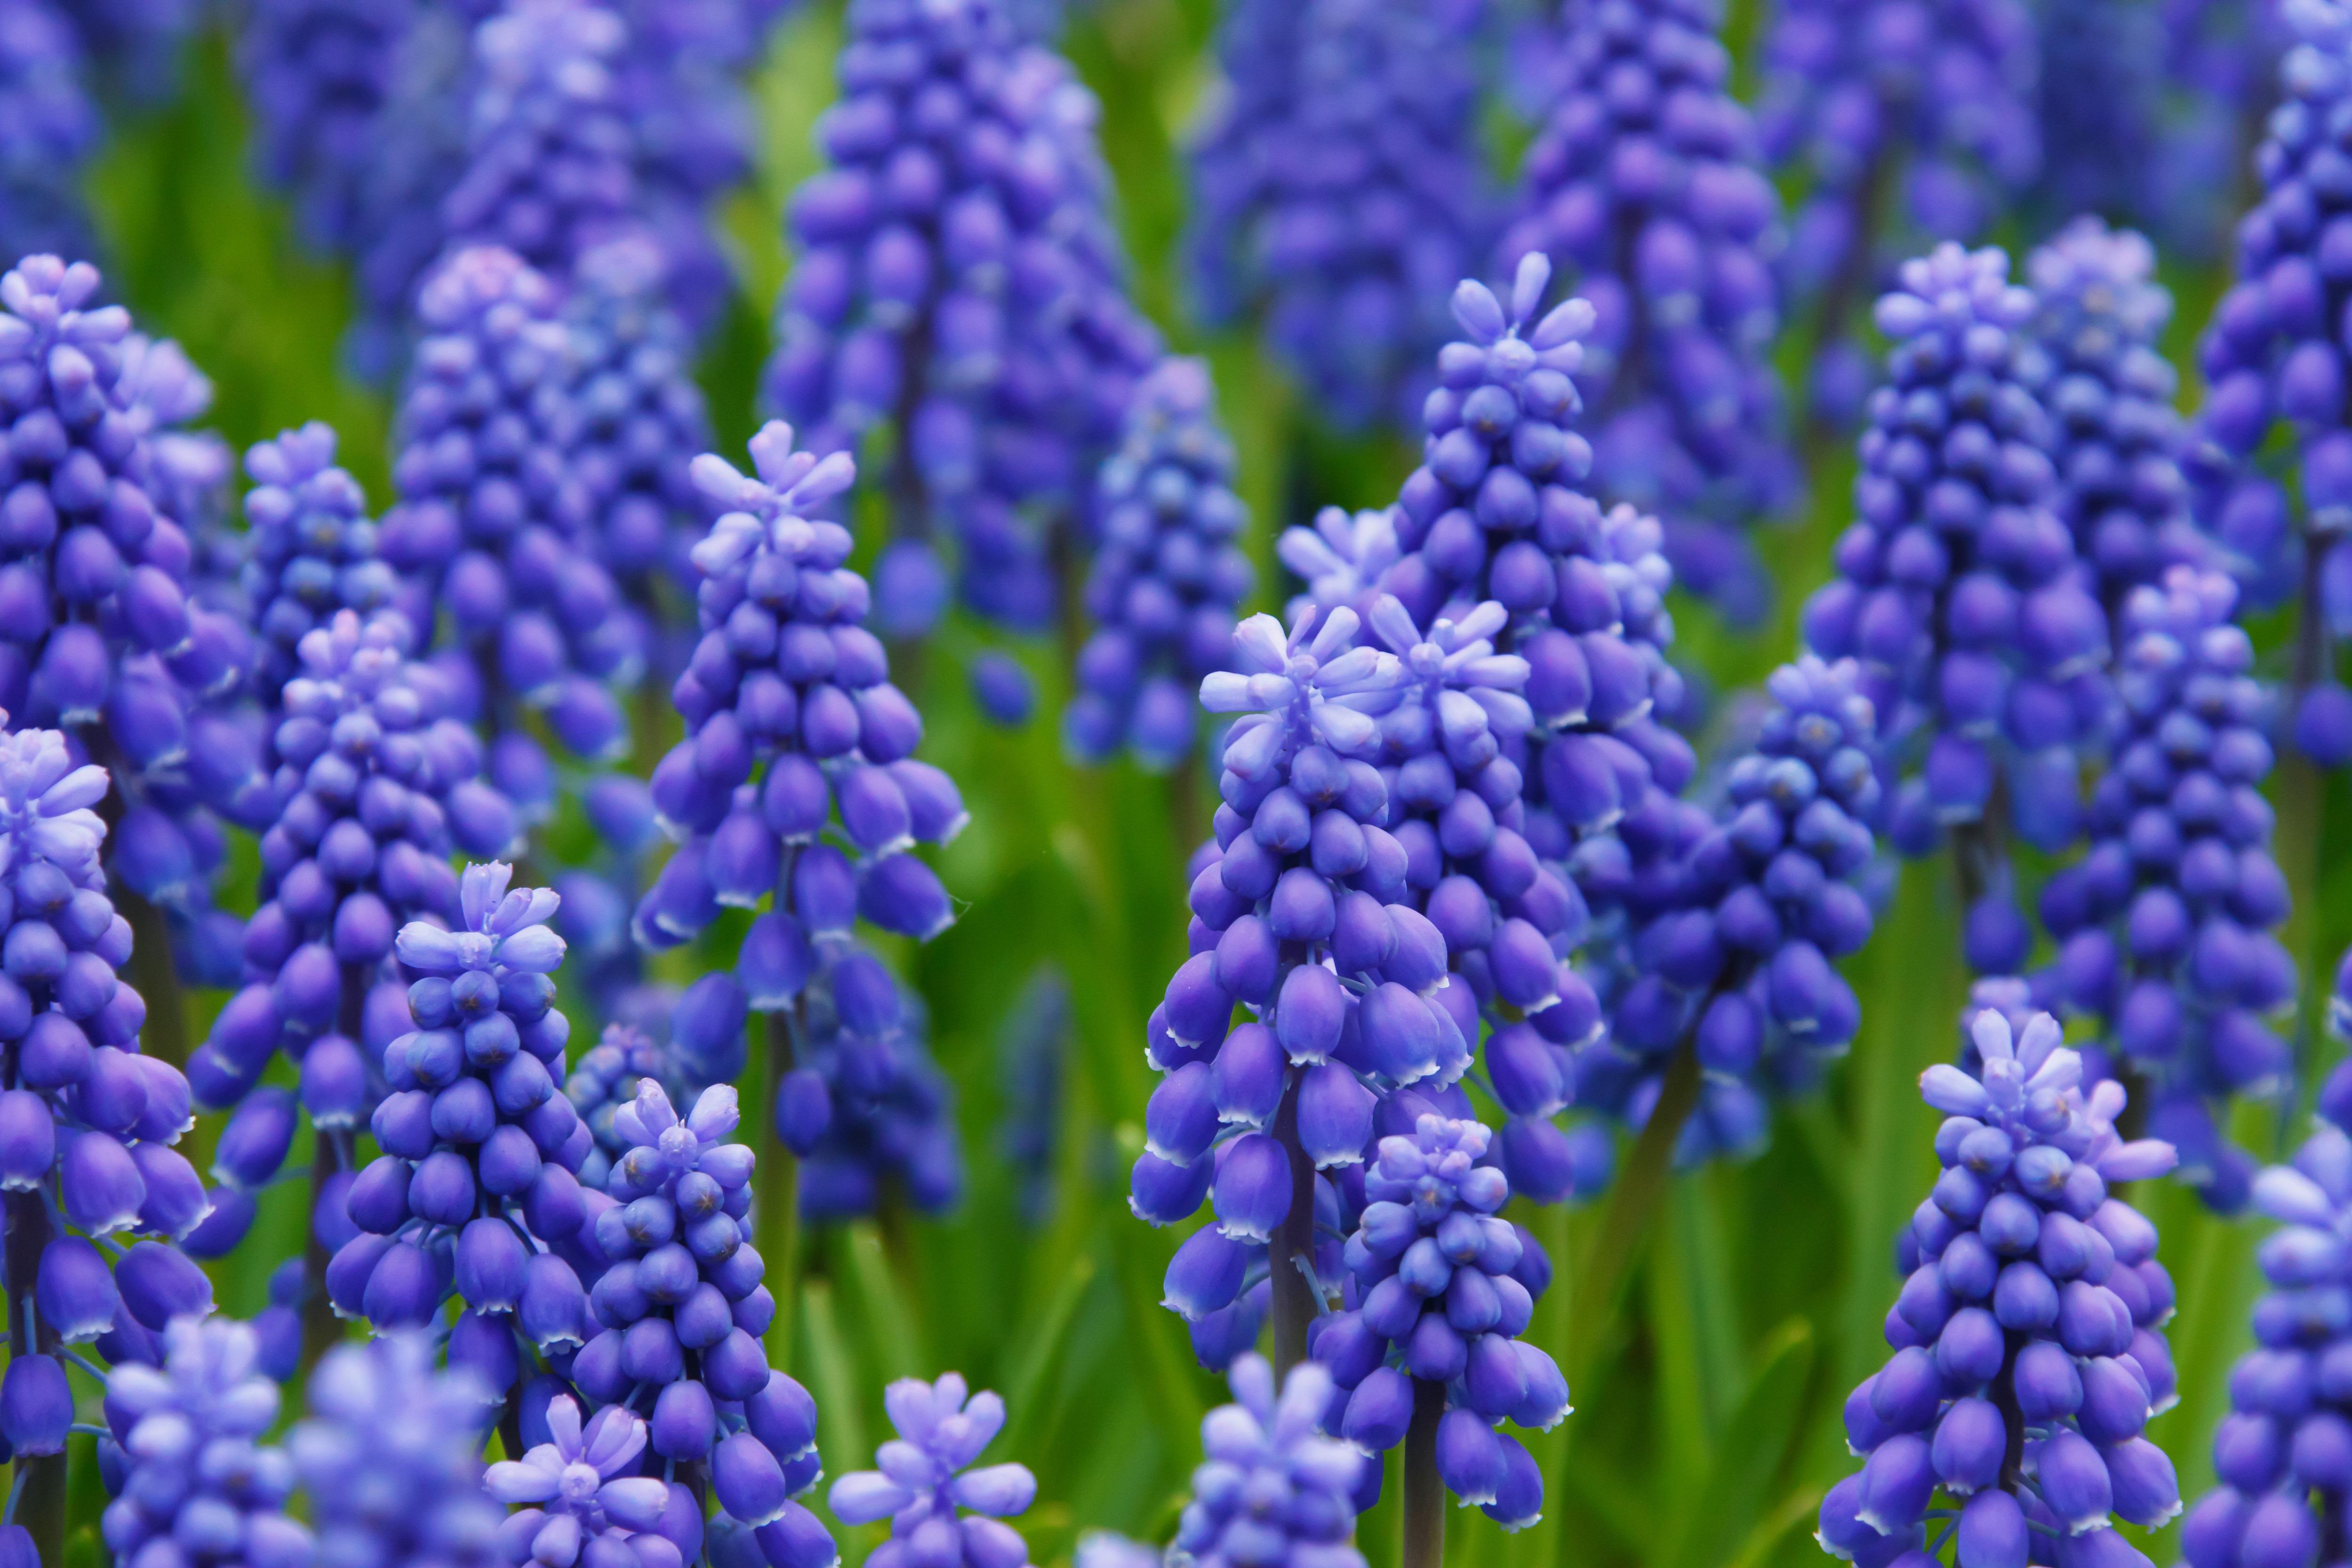 Free Images Blossom Flower Purple Bloom Green Fresh Botany